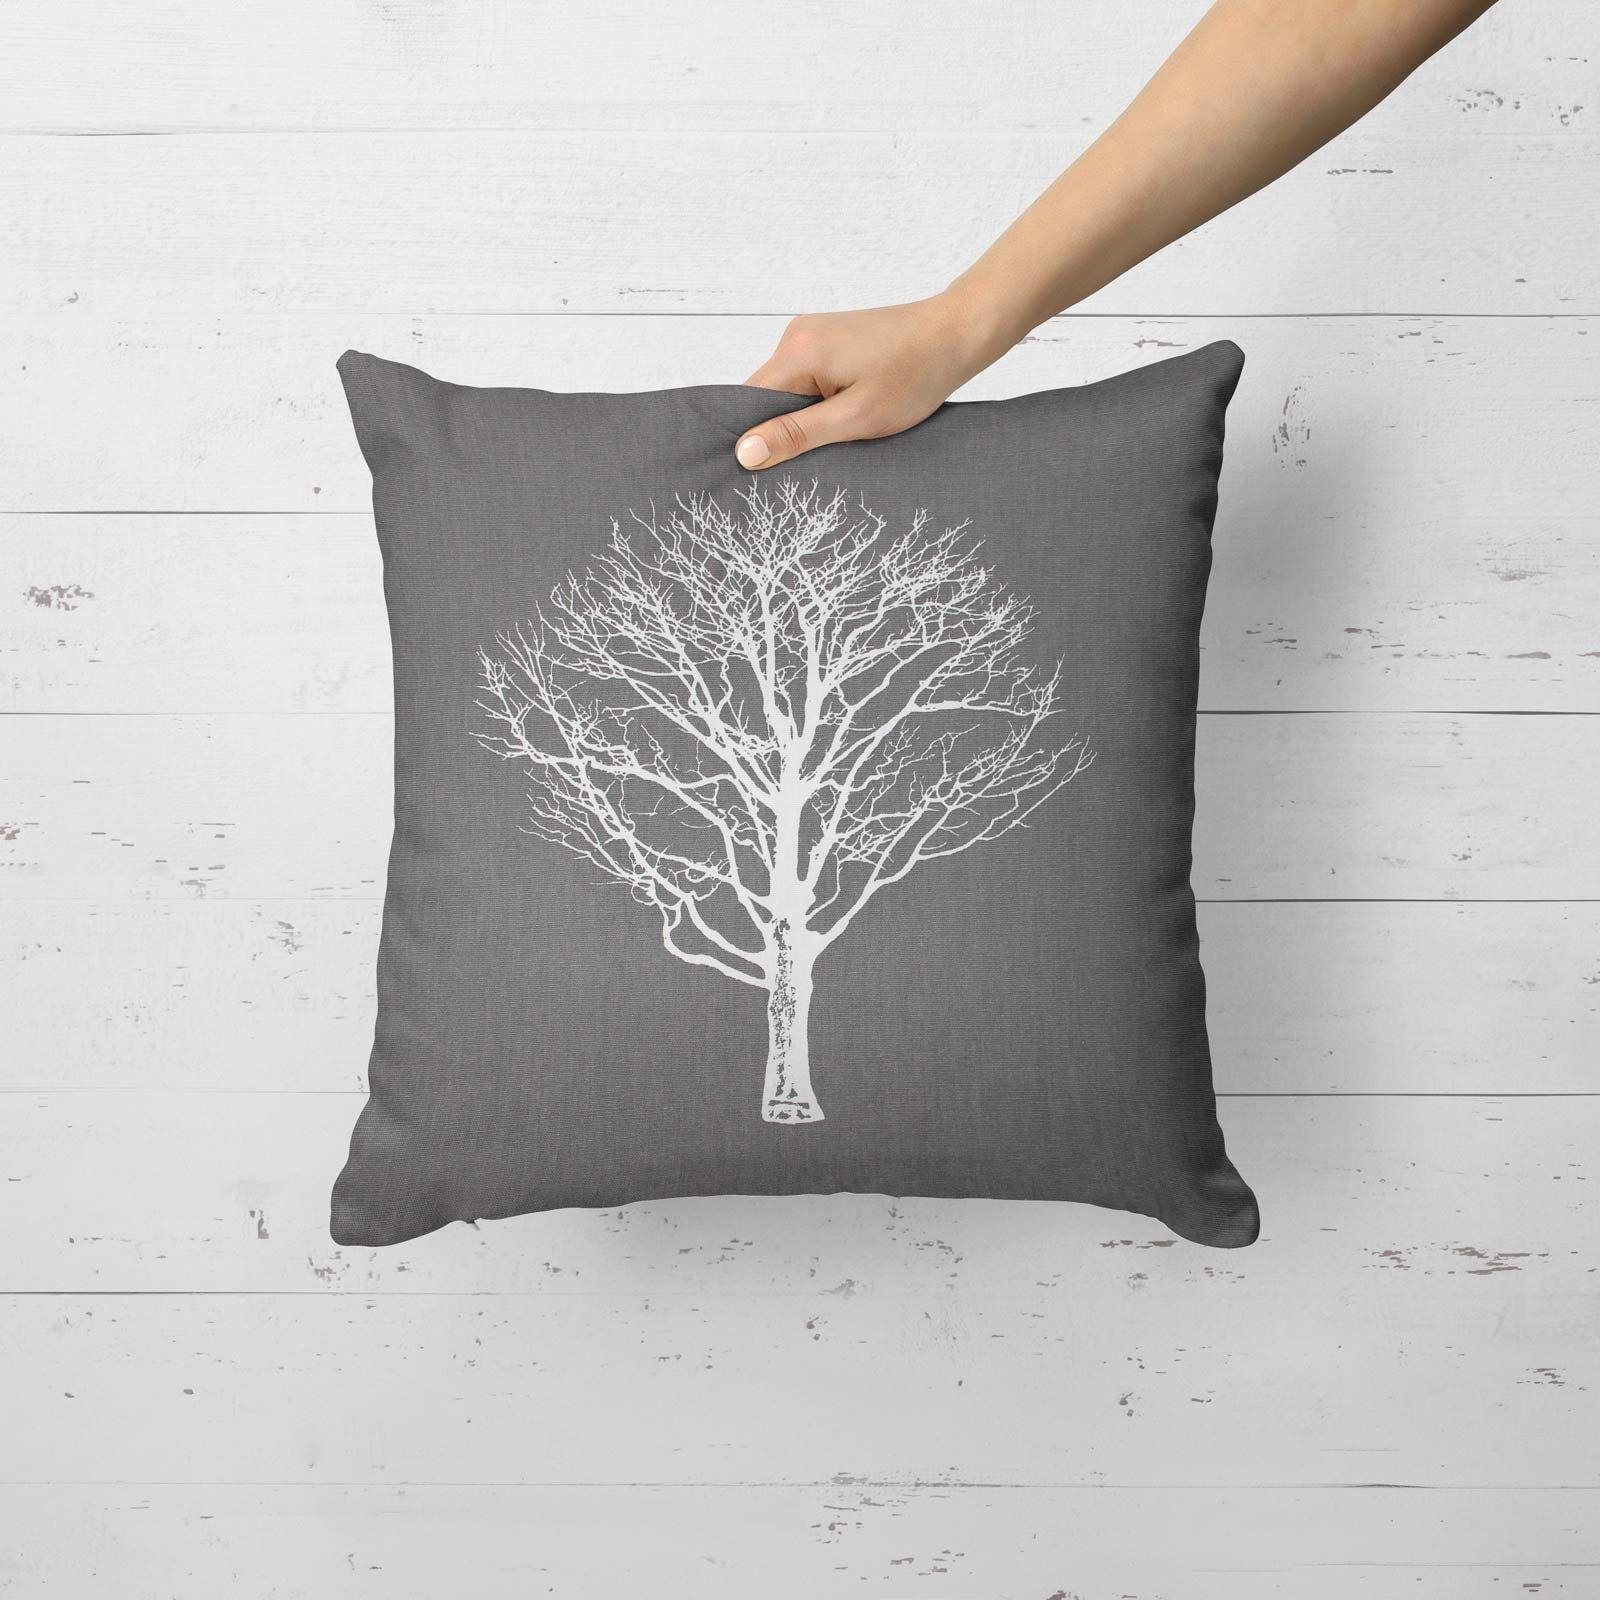 Woodland-Trees-Cushion-Cover-Modern-Reversible-Tree-Print-Covers-17-034-x-17-034 thumbnail 7